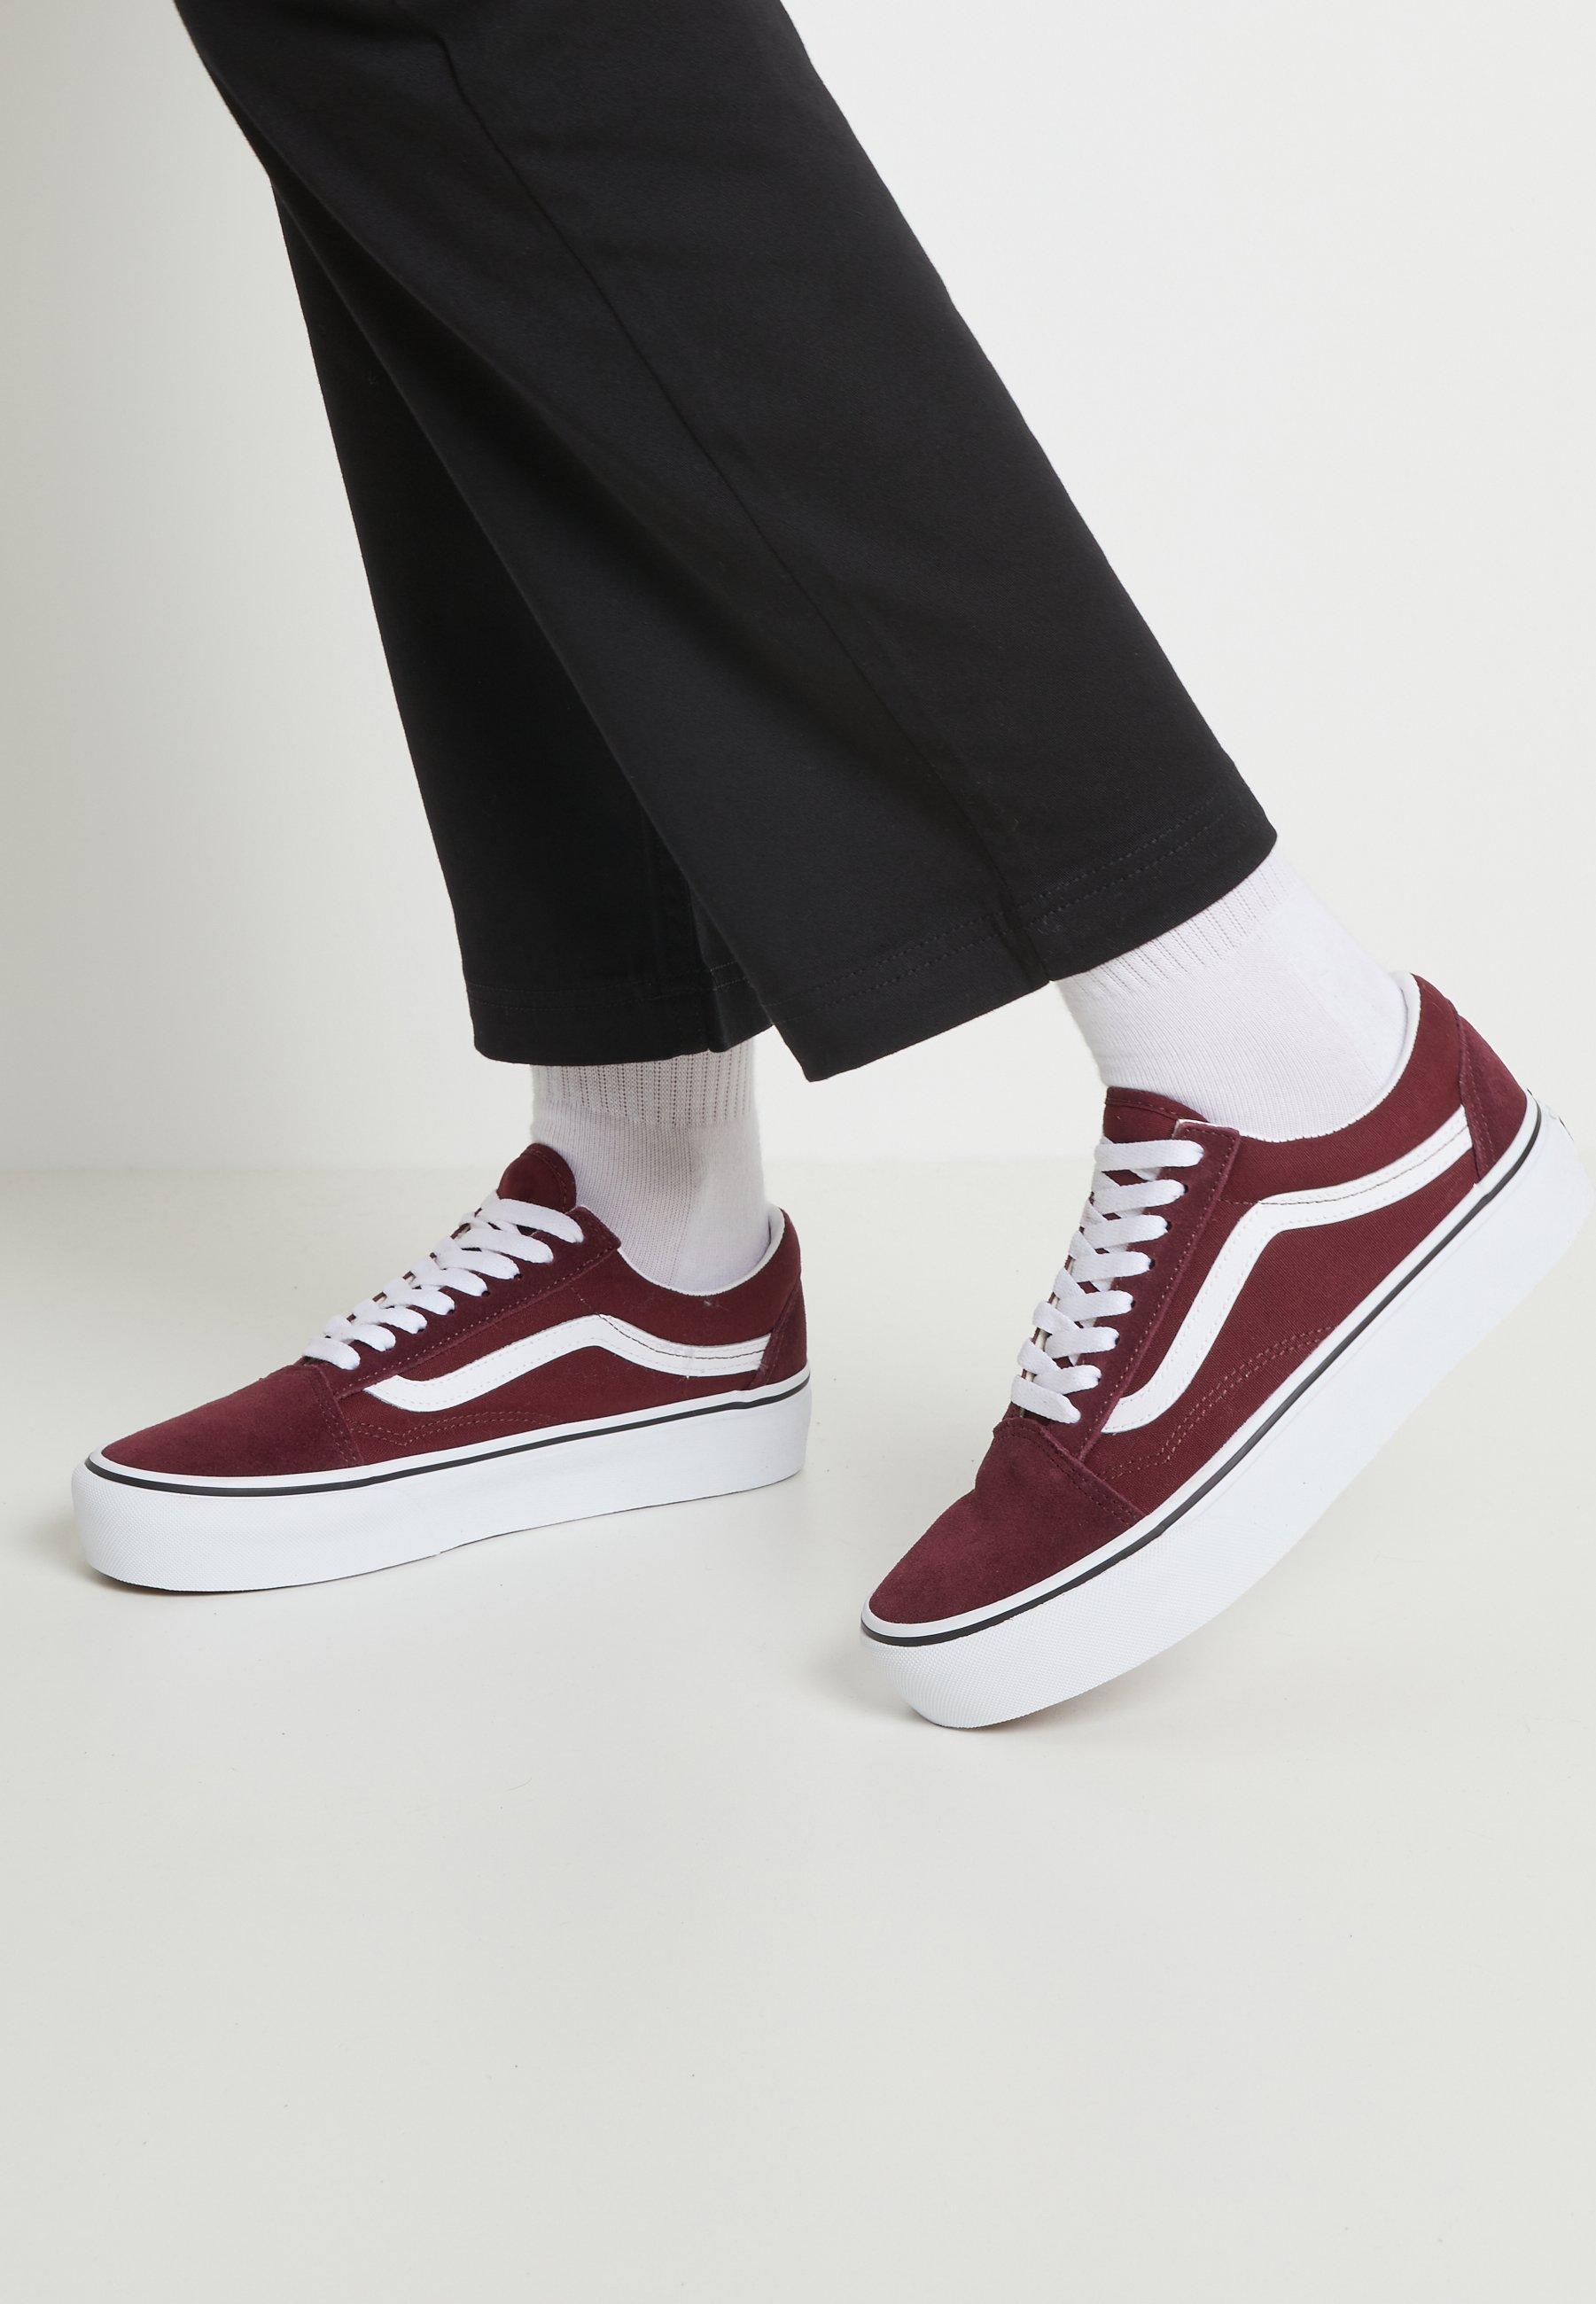 OLD SKOOL PLATFORM Sneaker low port royaletrue white